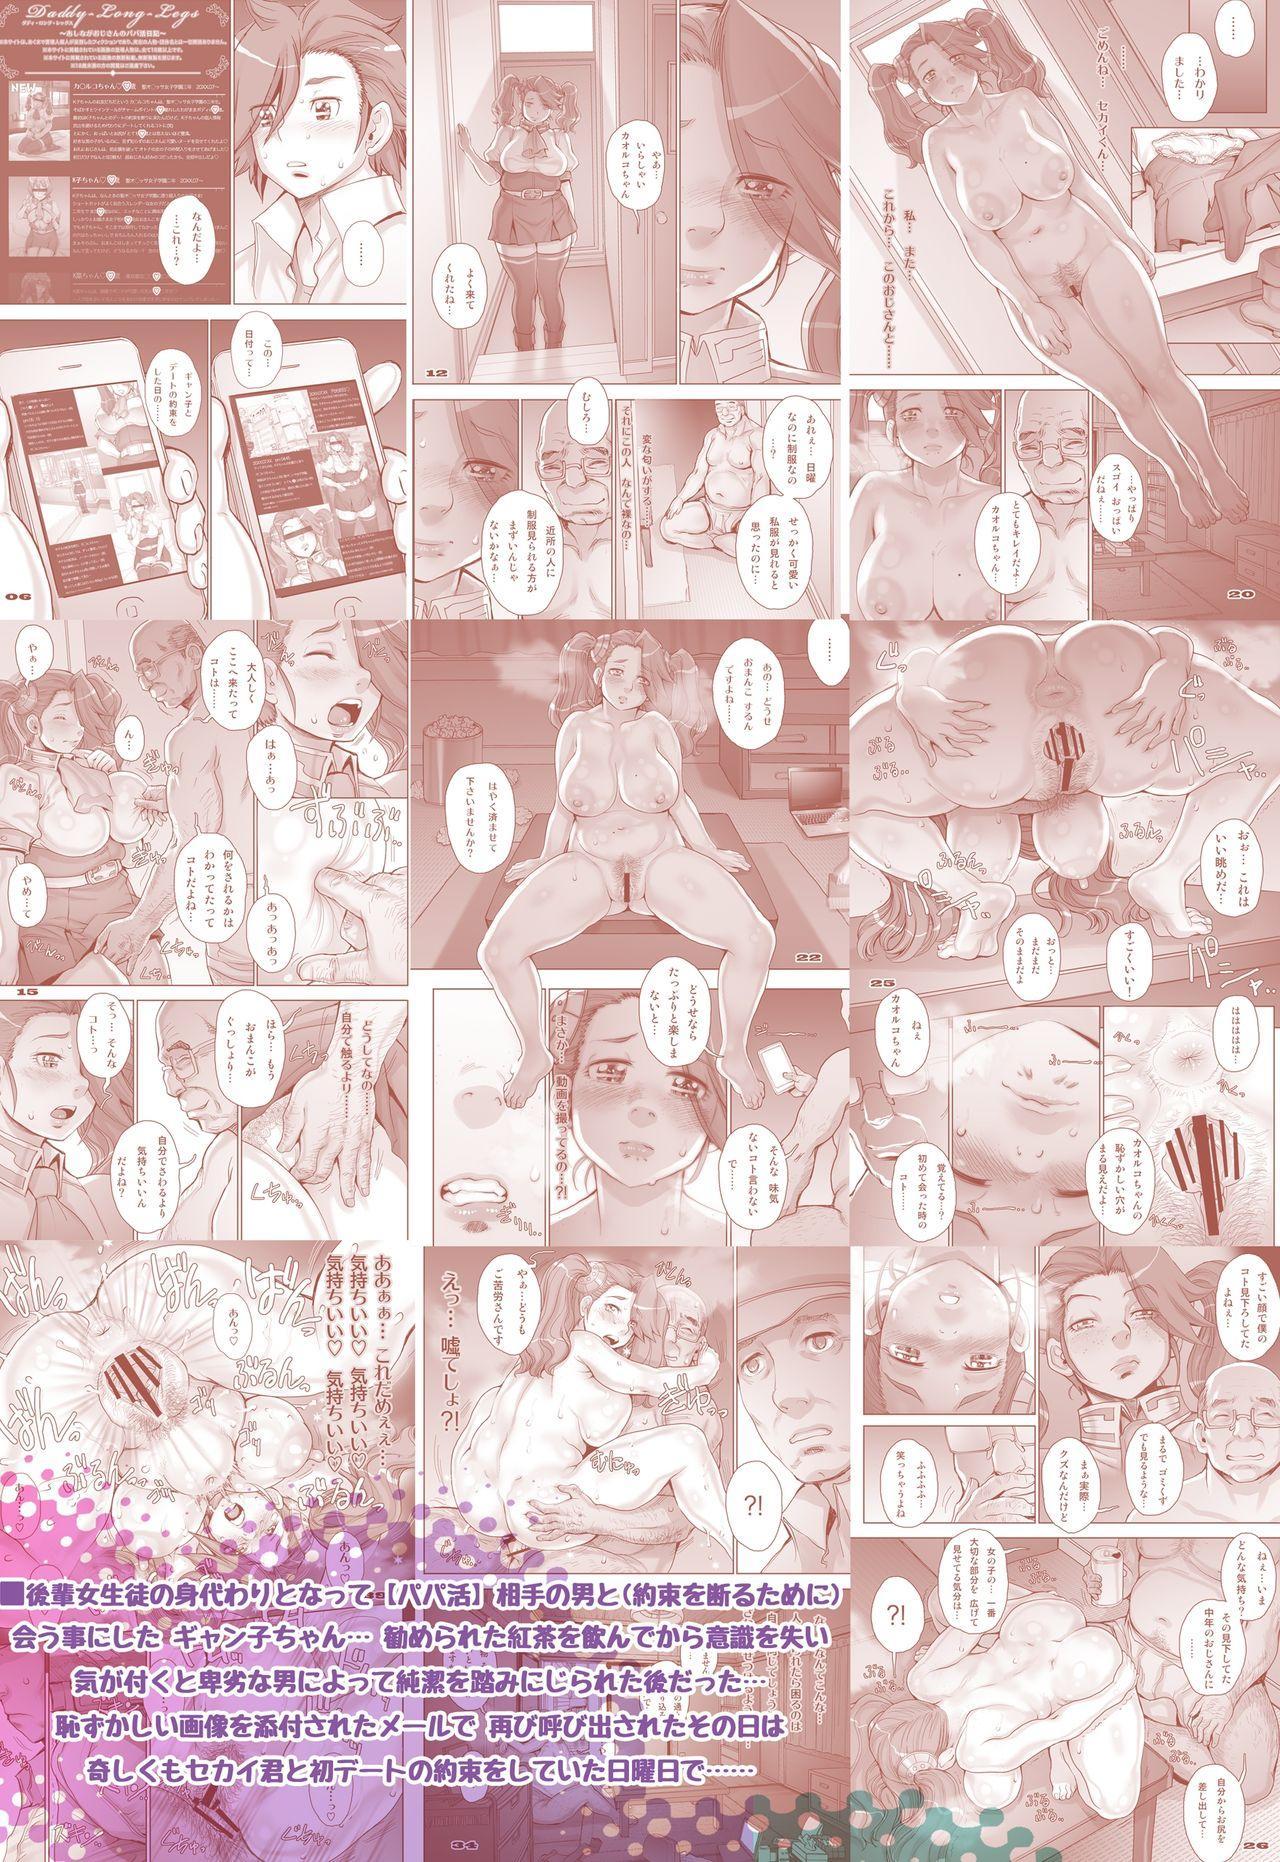 [Studio Tapa Tapa (Sengoku-kun)] Daddy-Long-Legs #3 (Gundam Build Fighters Try) [Digital] 55